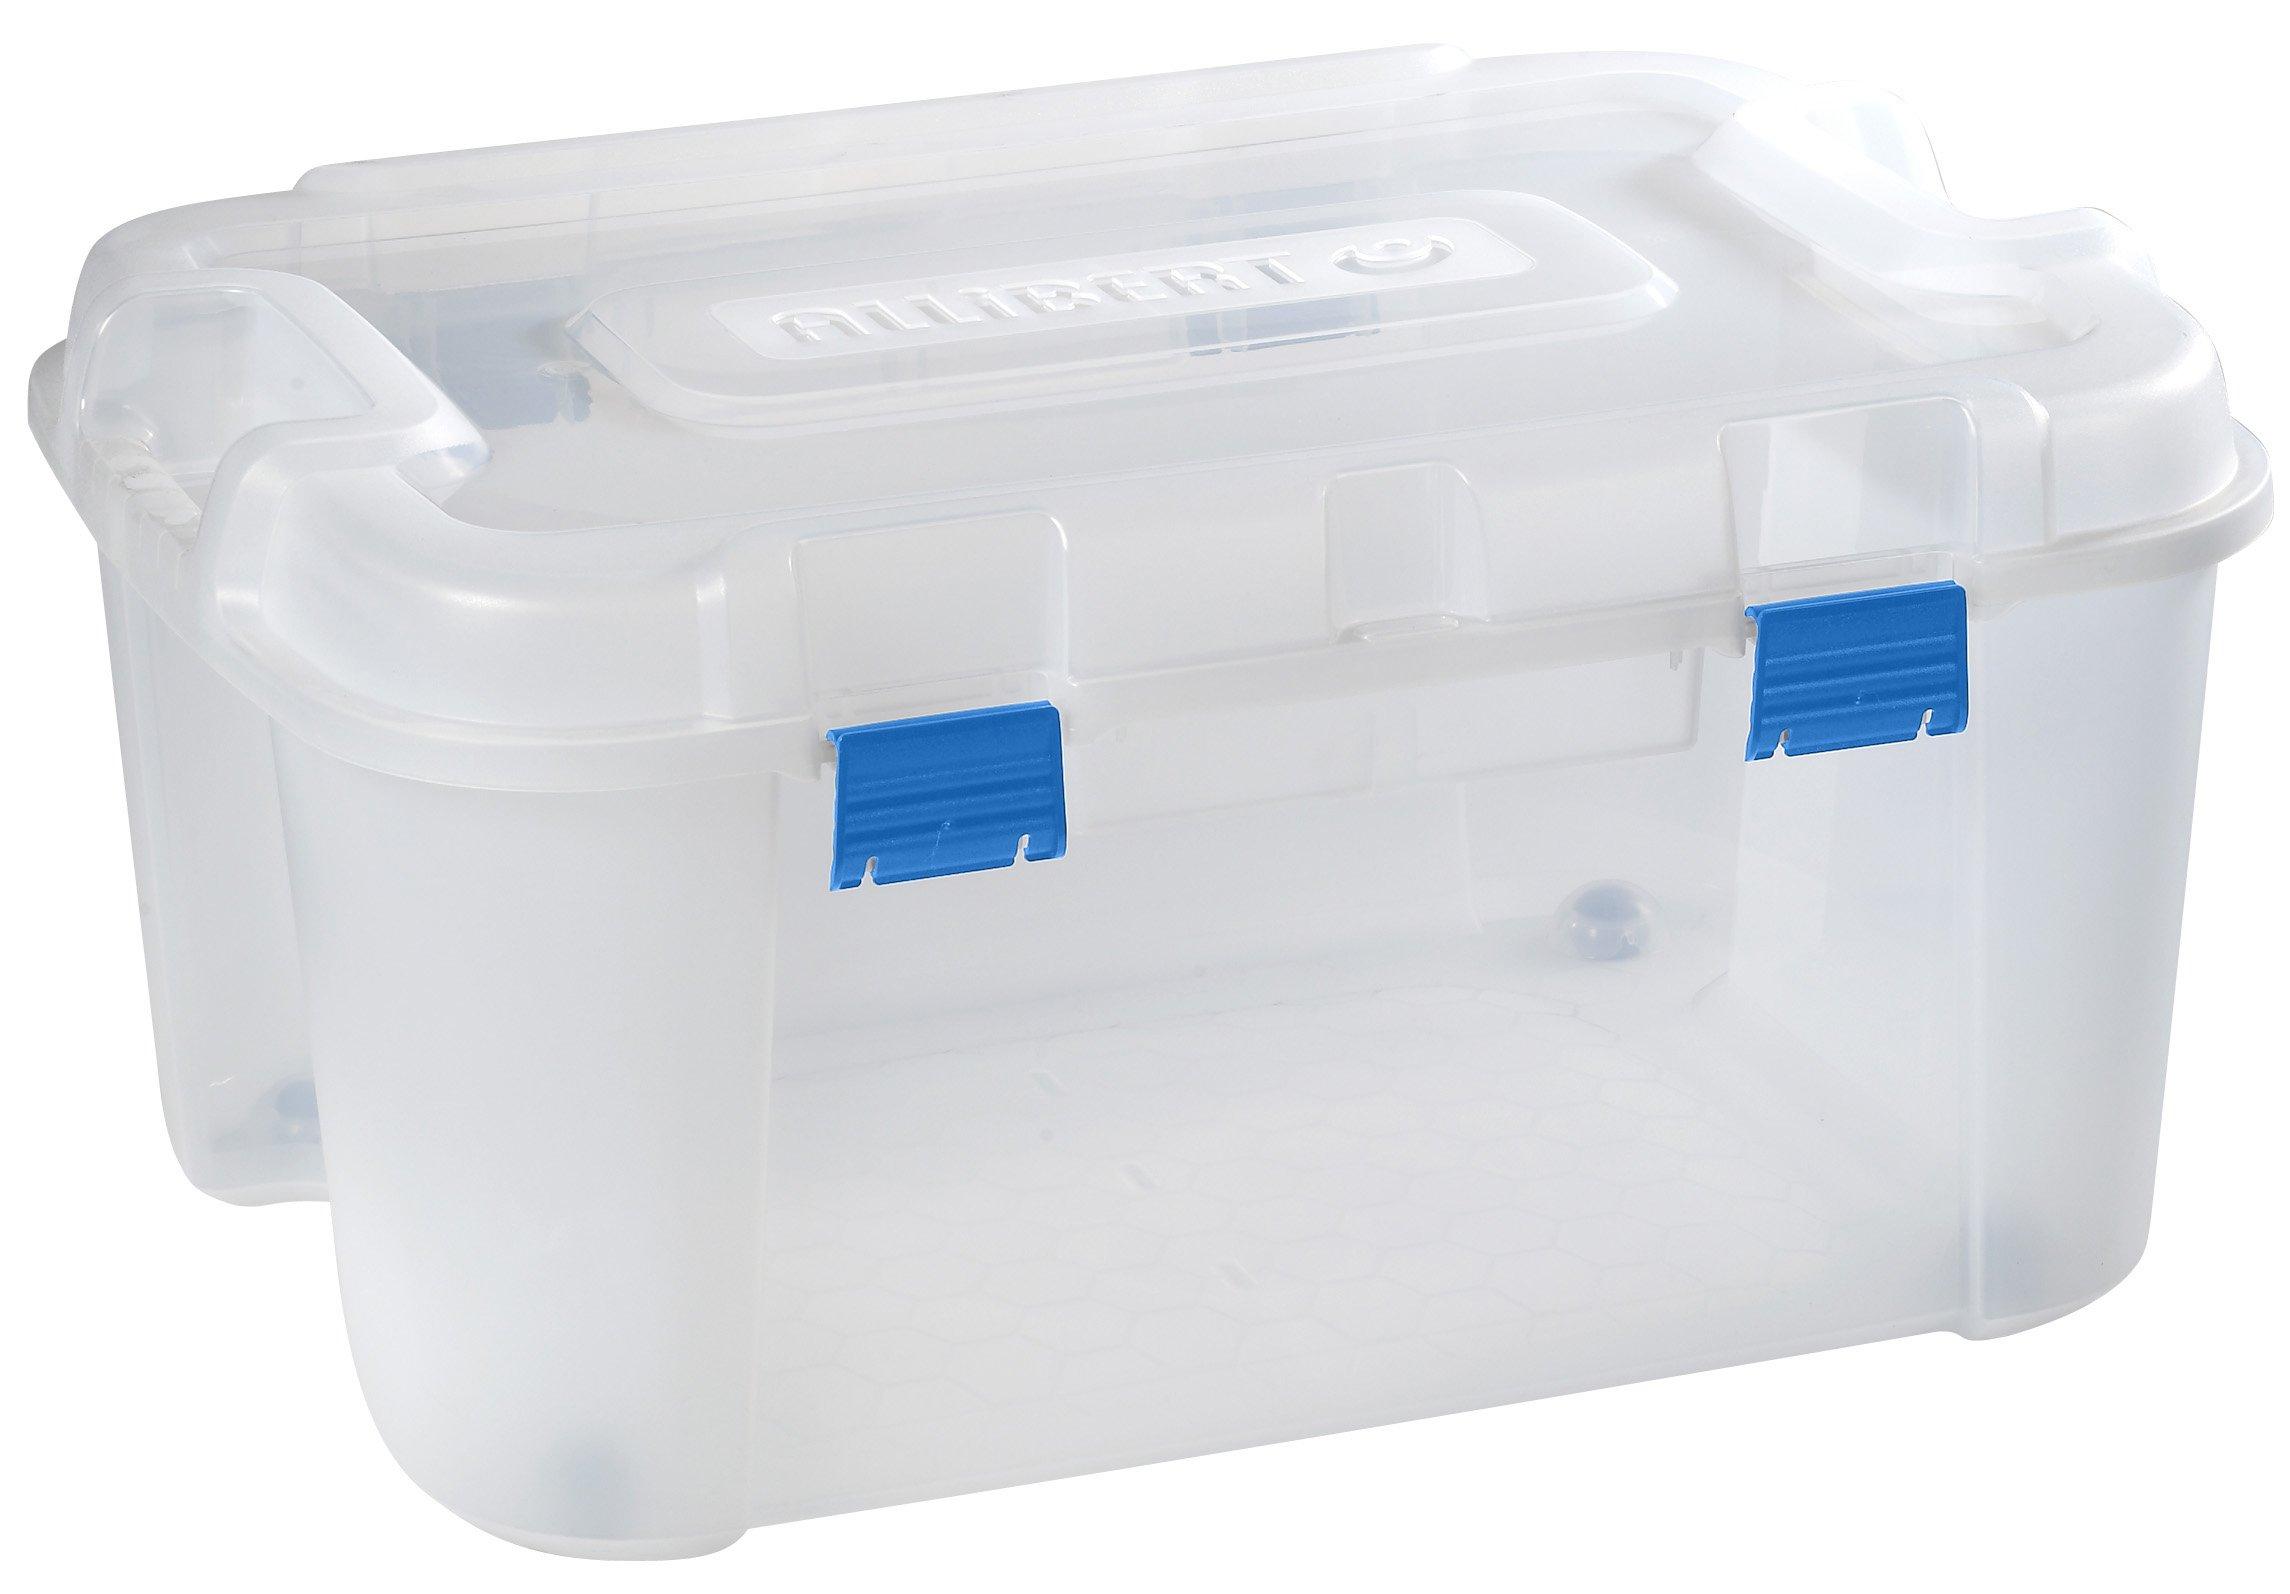 Allibert 191008 - Caja de almacenaje con Ruedas (140 l, Polipropileno), Transparente: Amazon.es: Hogar